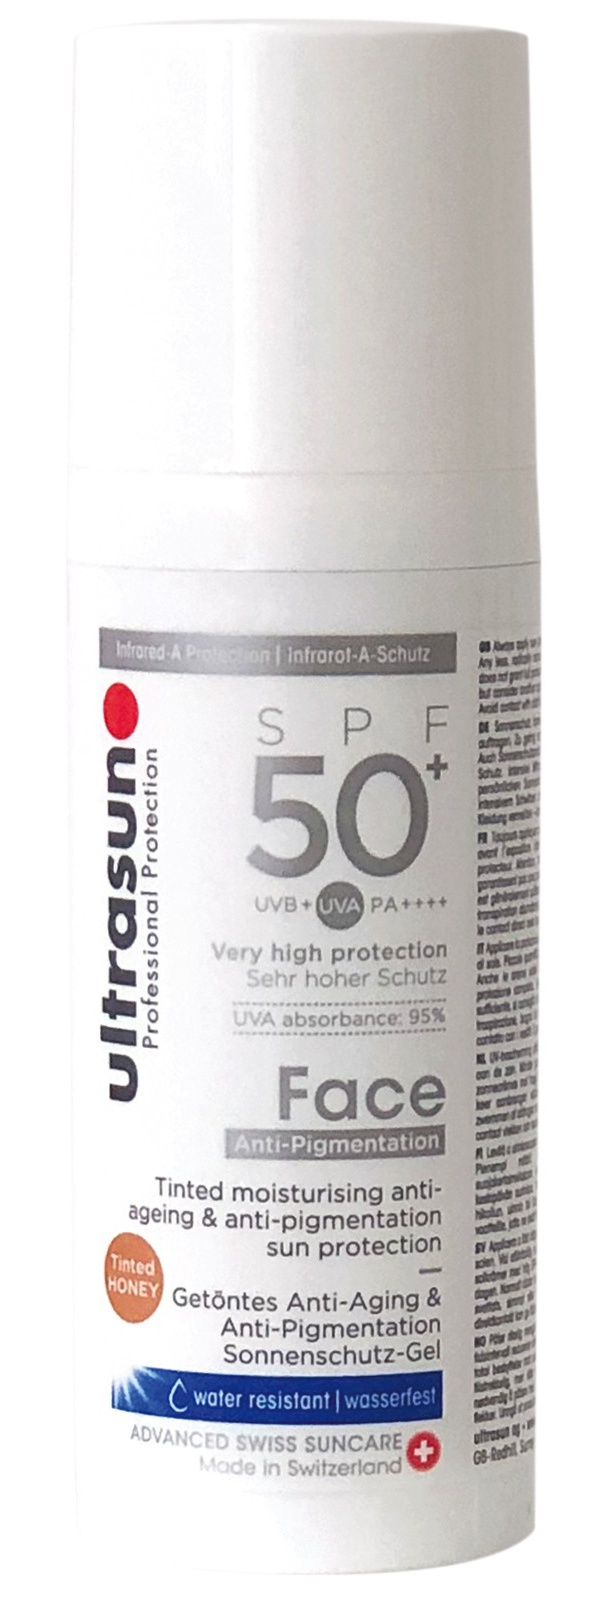 Ultrasun Face Tinted Anti-Pigmentation SPF50